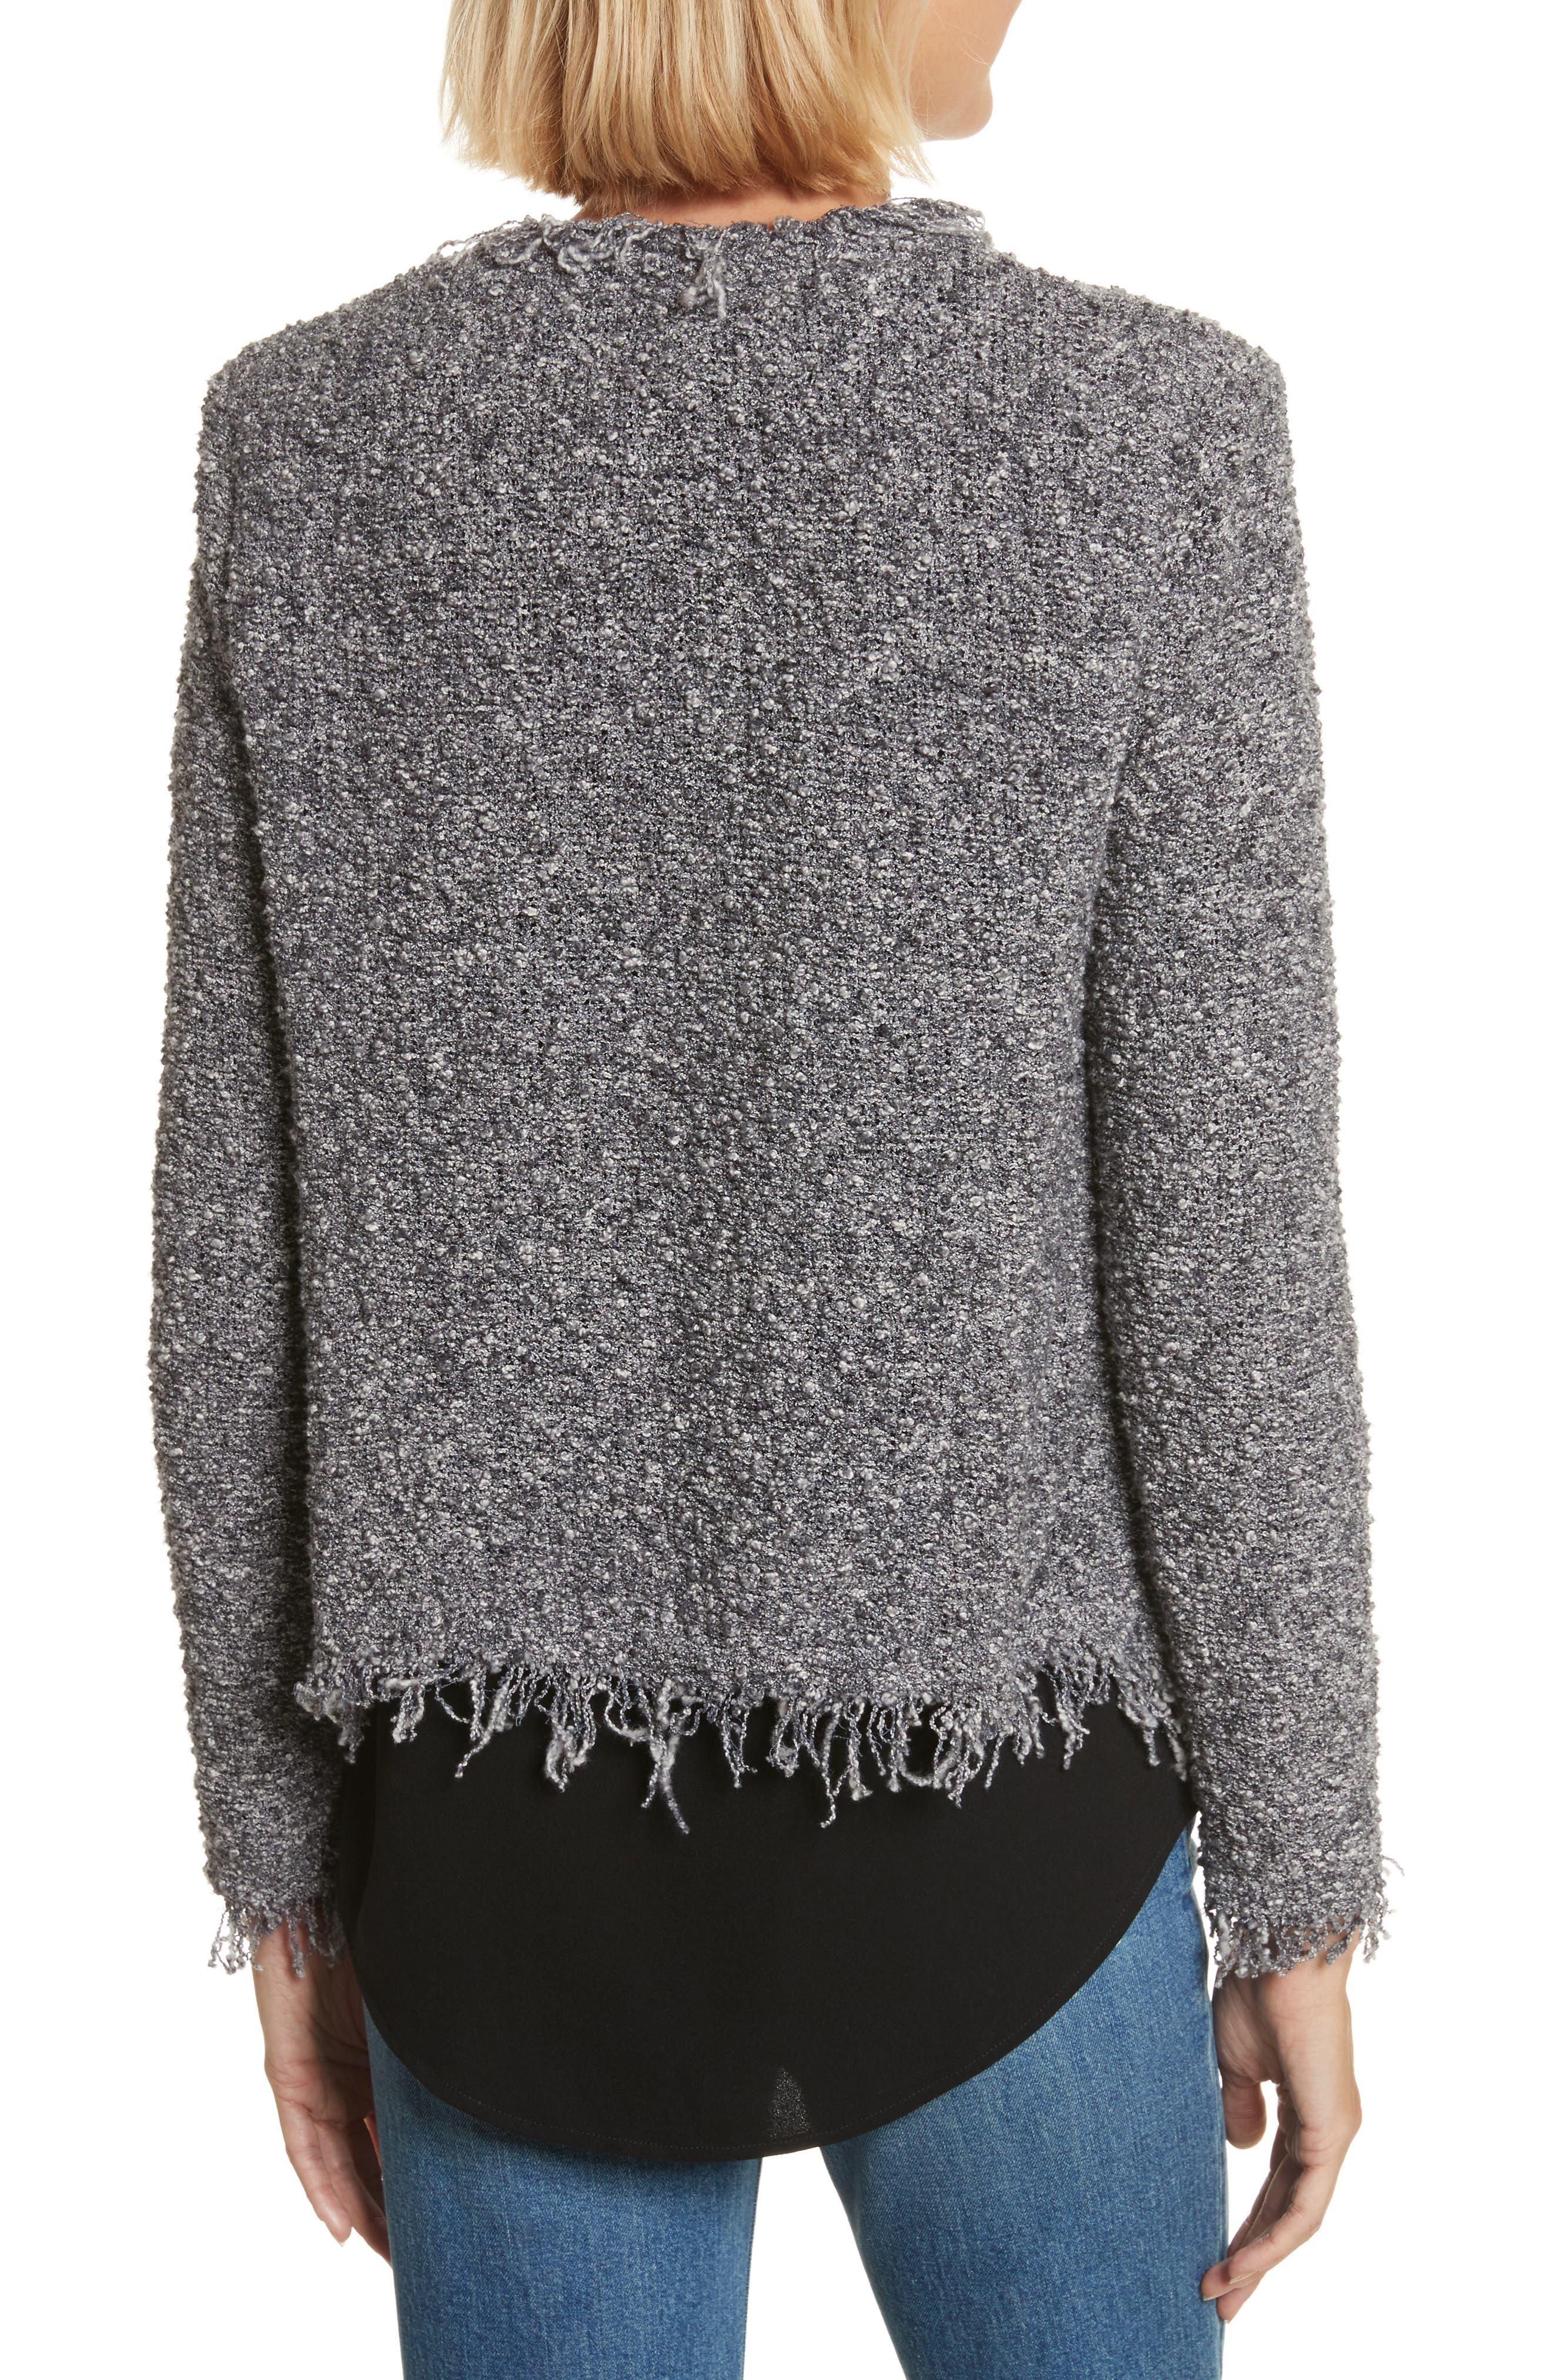 Shavanix Tweed Jacket,                             Alternate thumbnail 2, color,                             Dark Grey